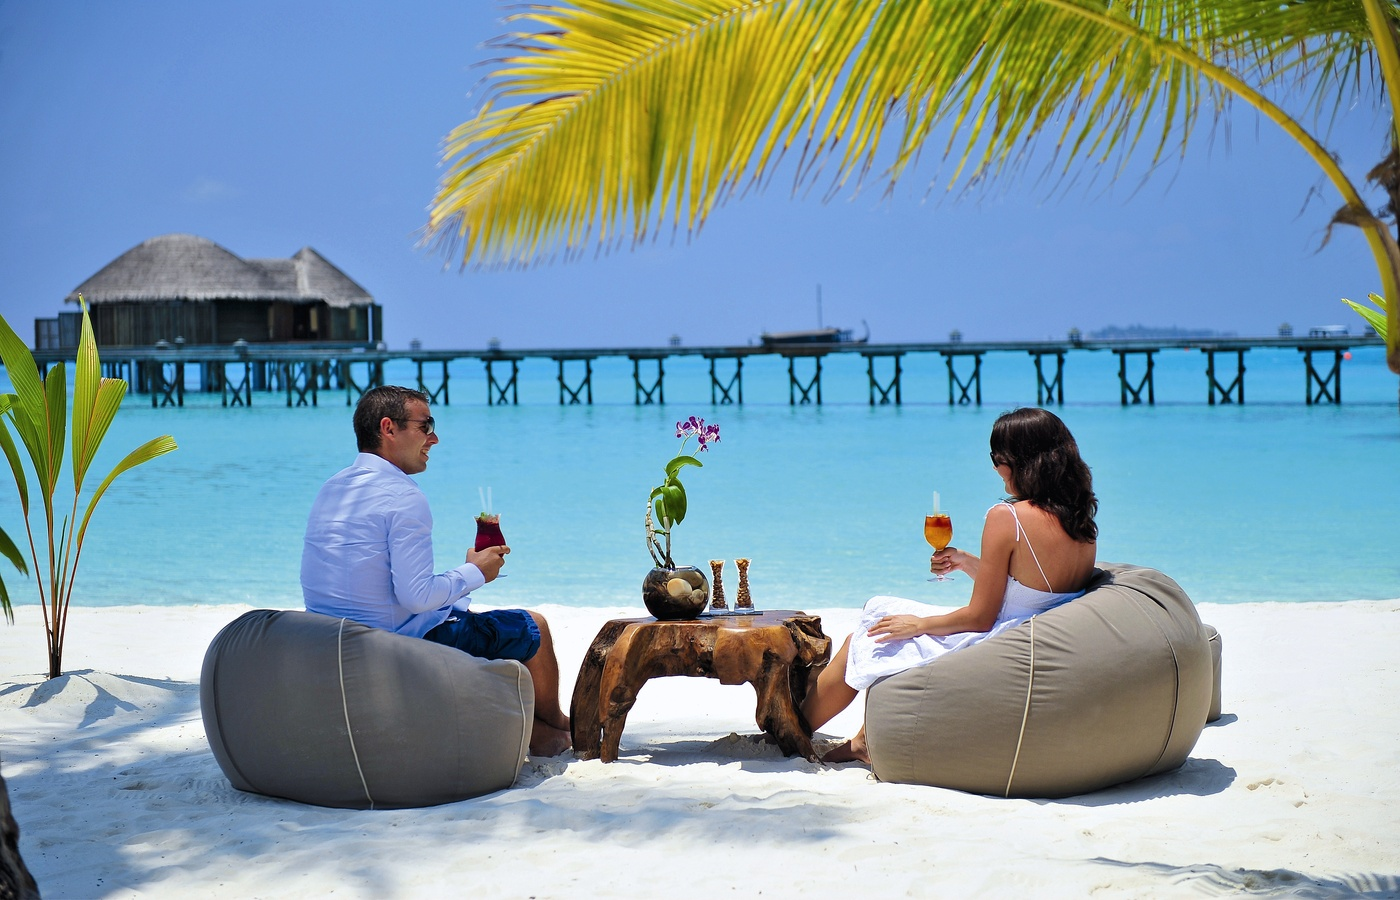 Картинки по запросу mauritius people beach